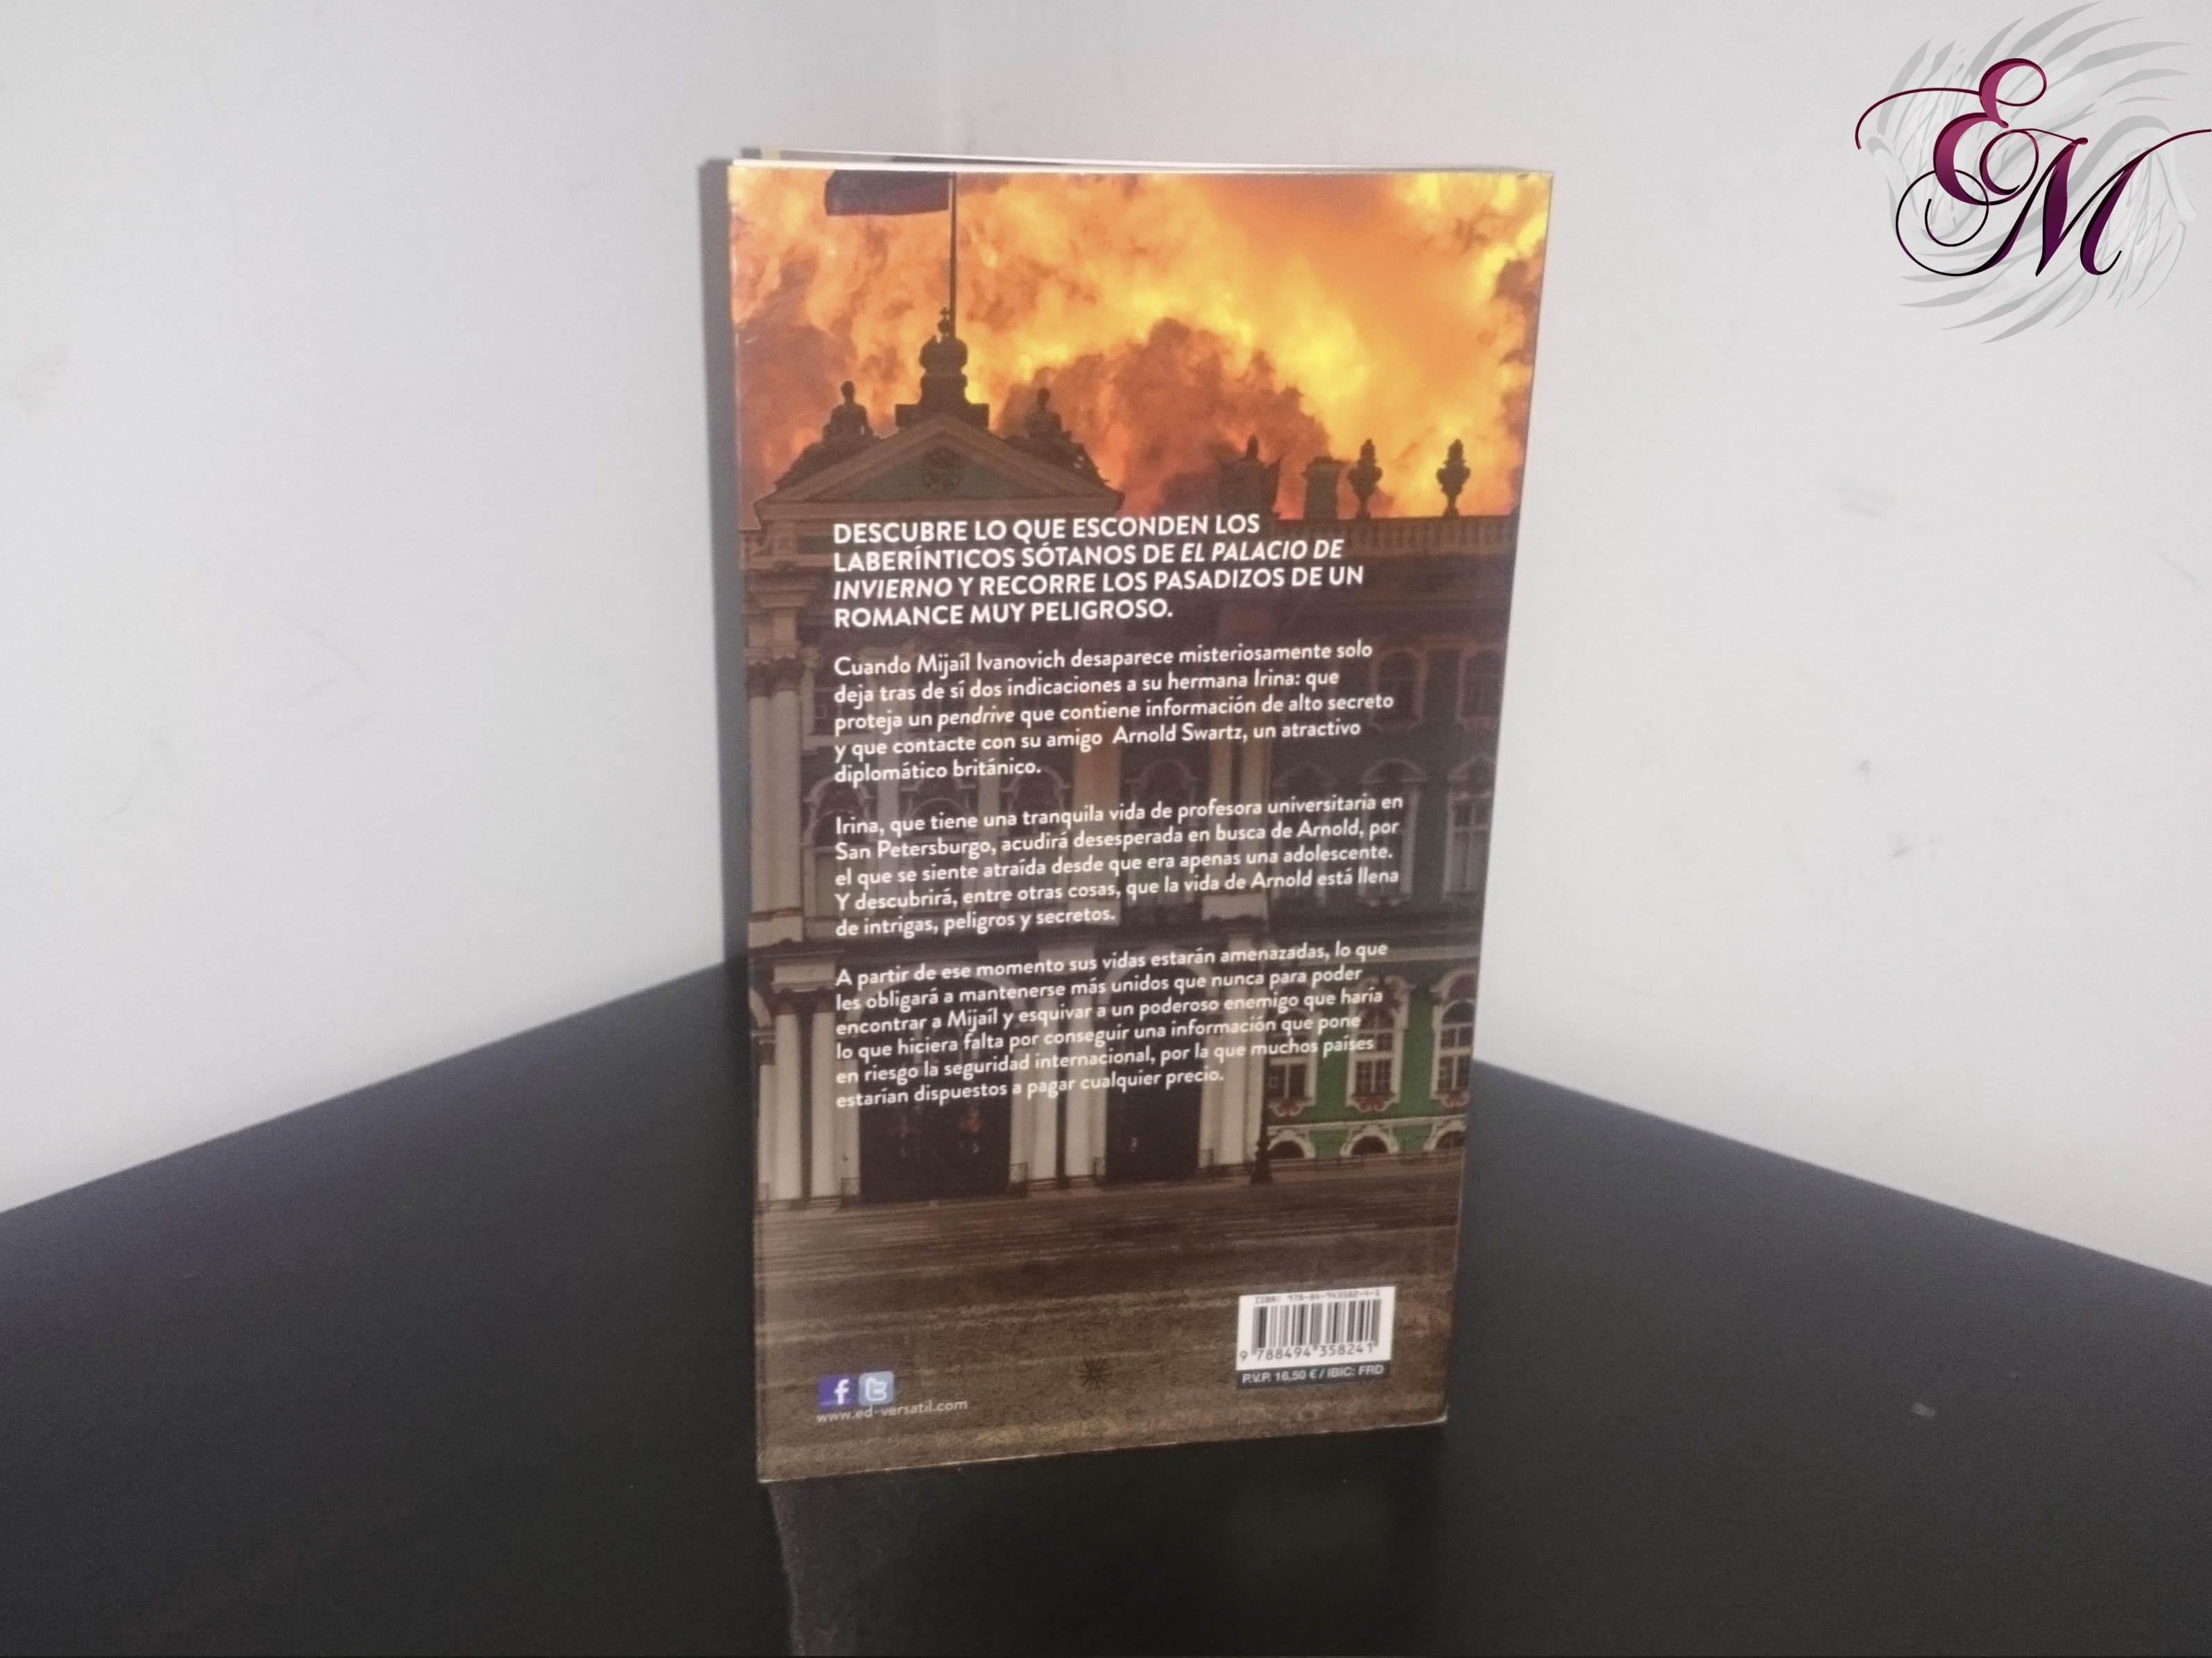 Palacio de invierno, de Menchu Garcerán - Reseña